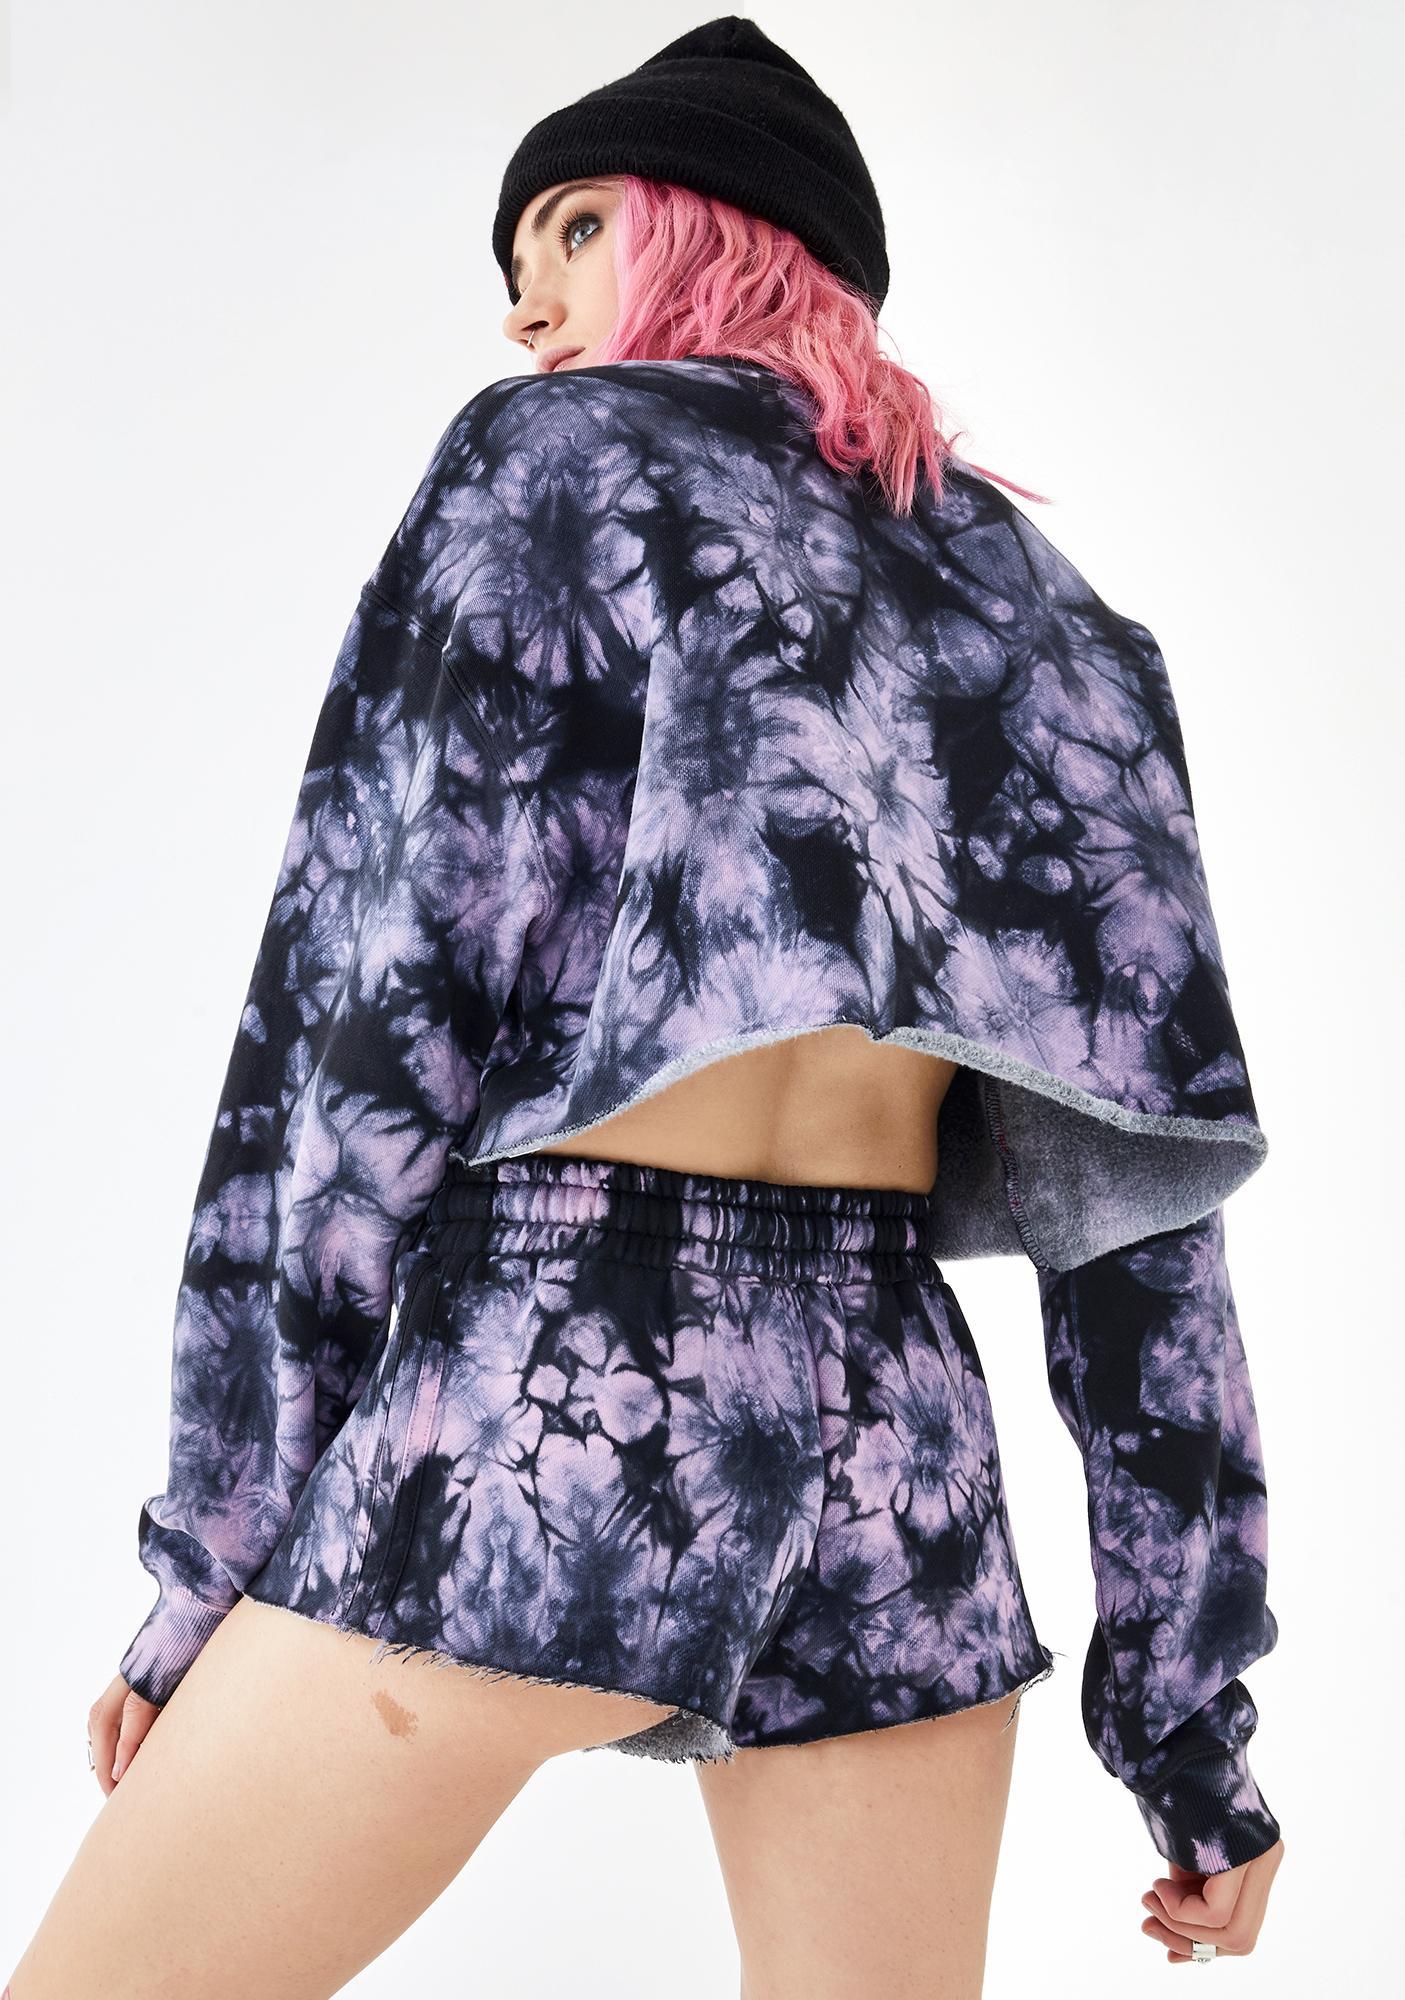 Current Mood Dark Dreams Tie Dye Shorts